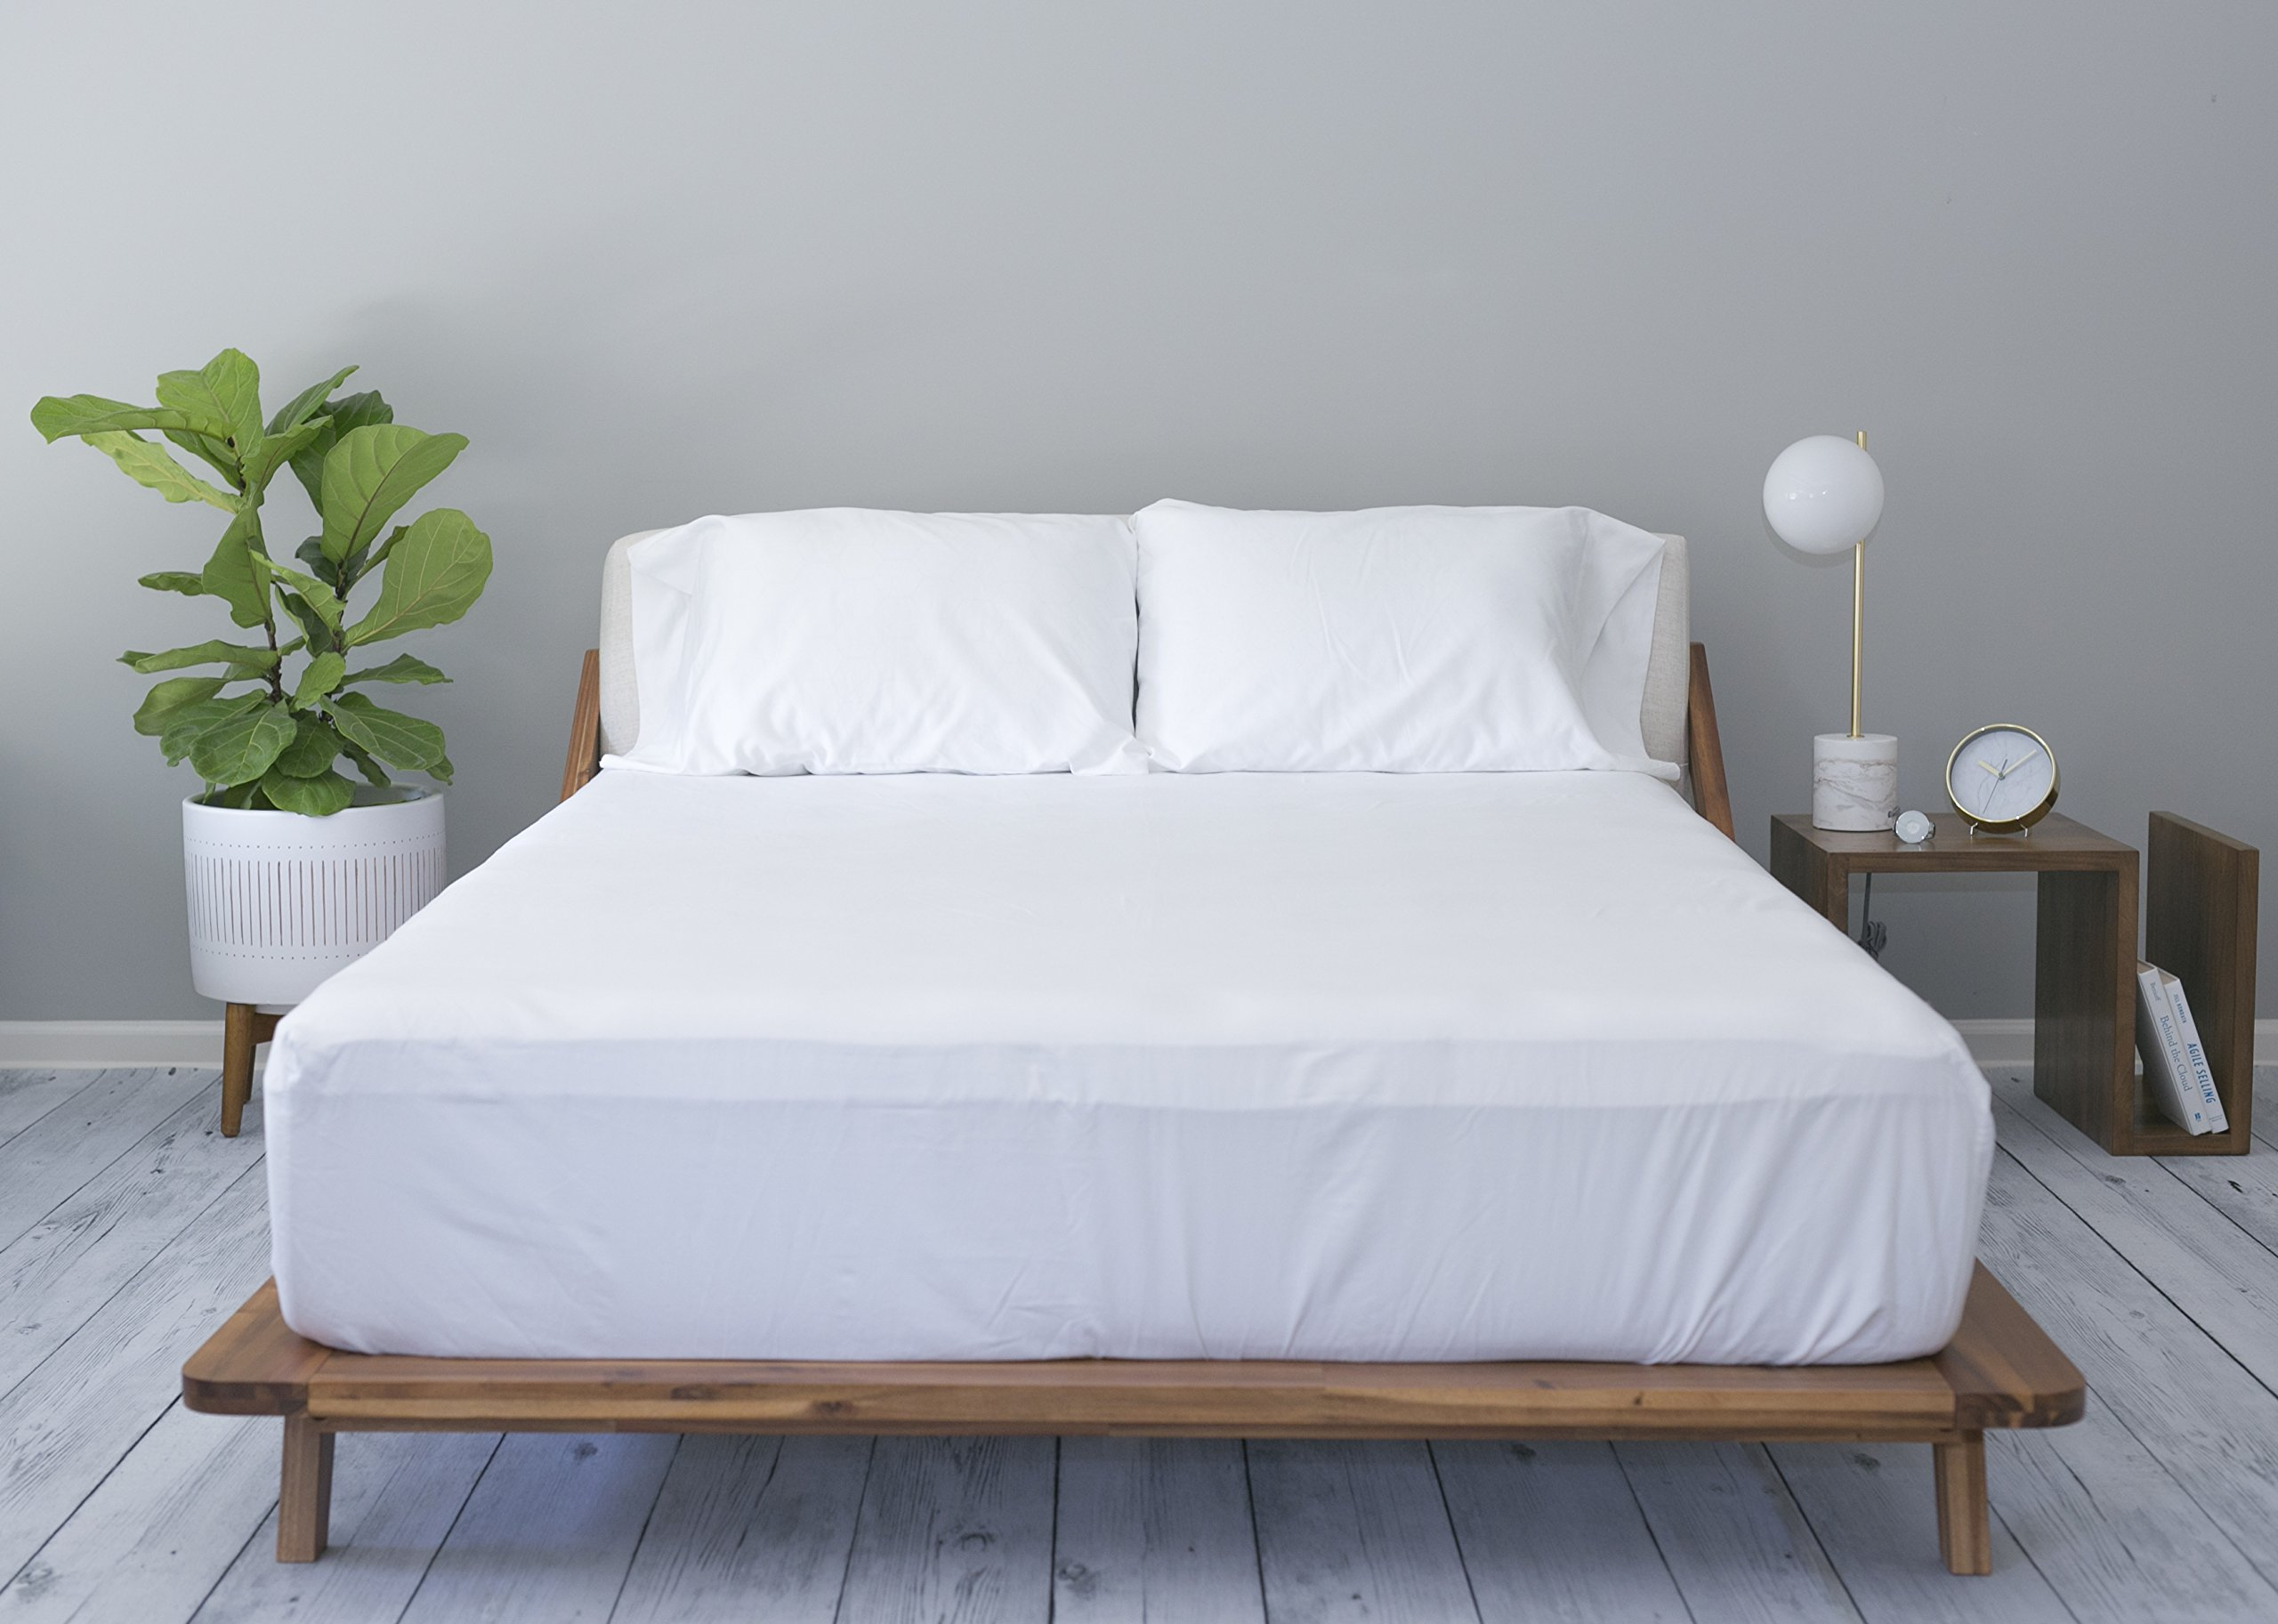 100% Cotton Sateen - Luxury - 500 Thread Count - Deep Pocket - Sheet Set (QUEEN, WHITE)